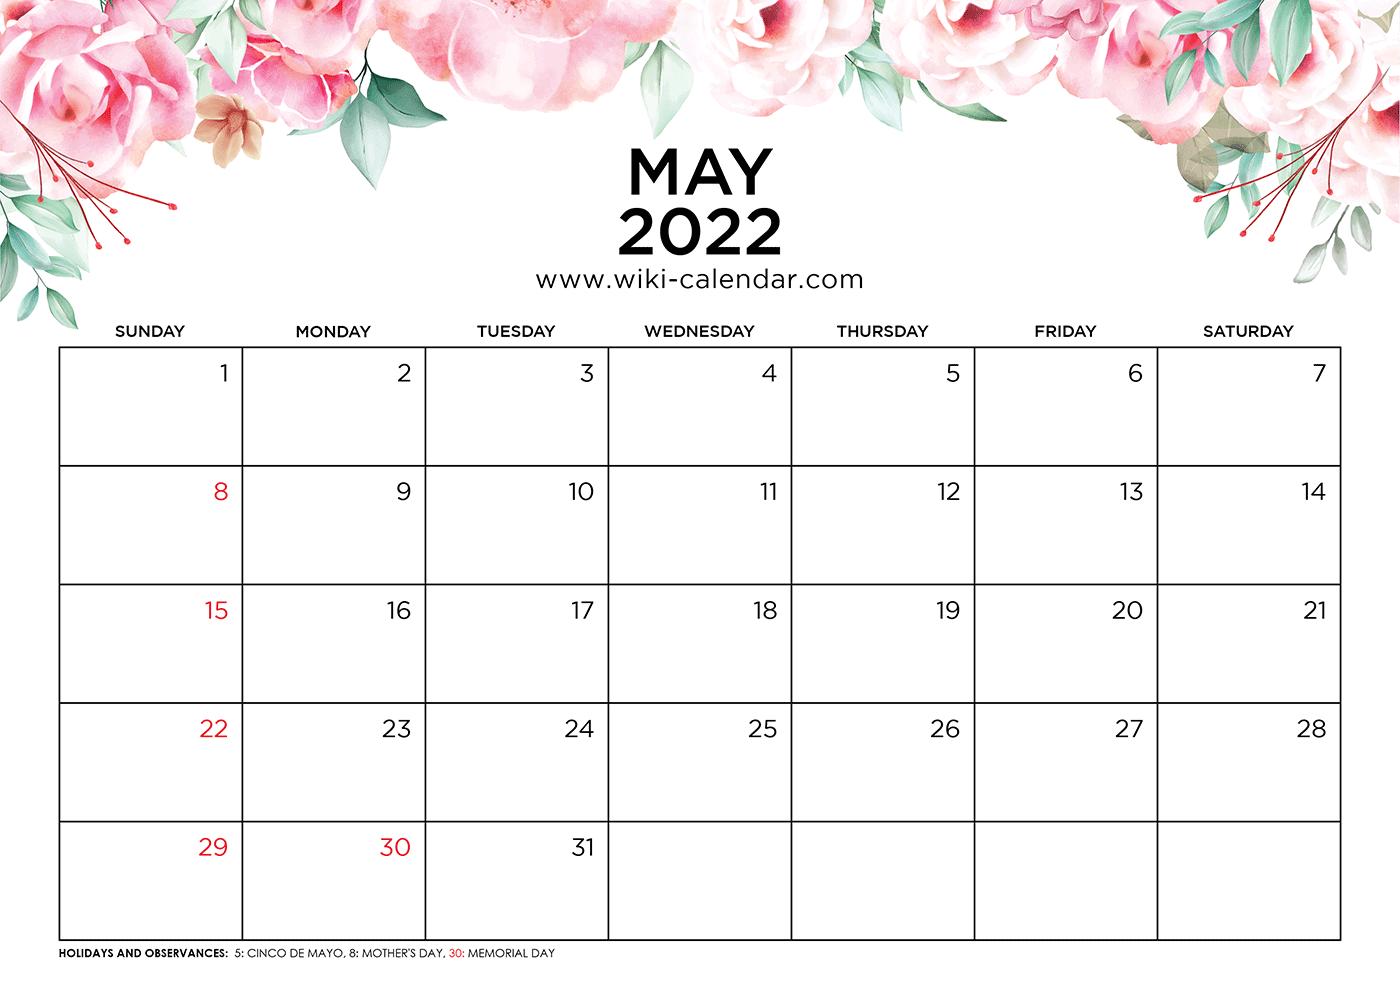 May 2022 Calendar Printable with Holidays